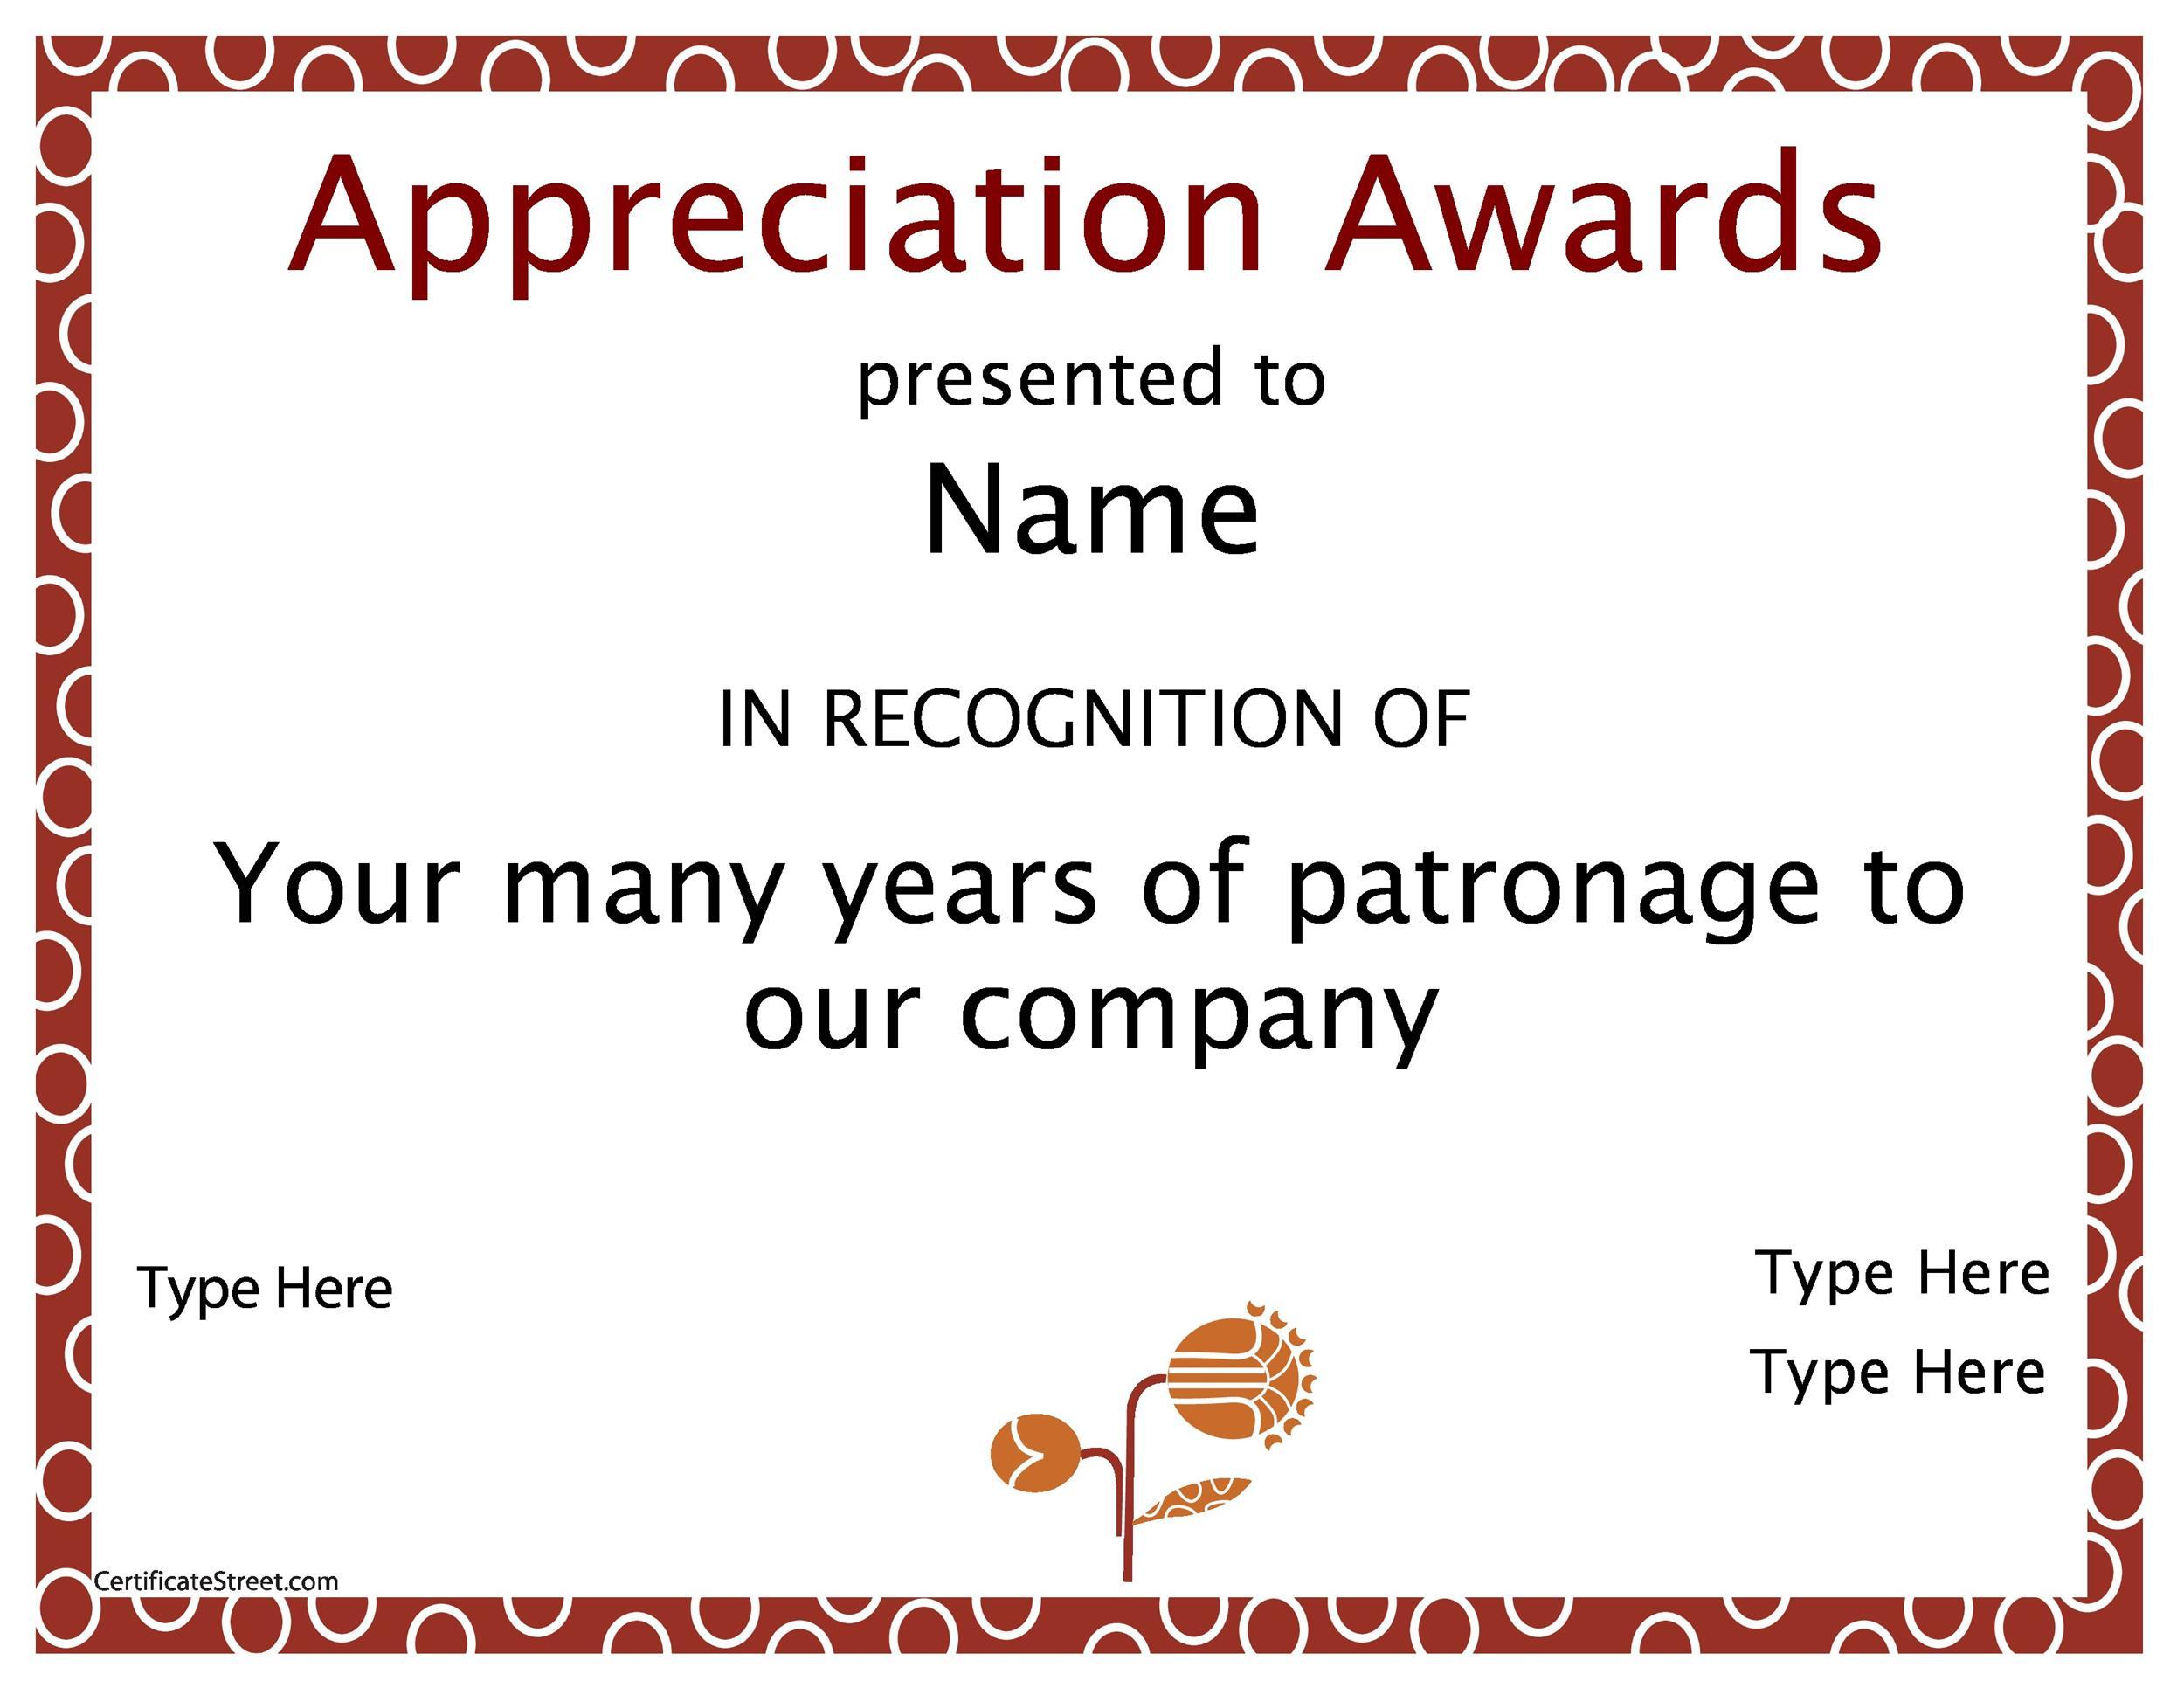 Most Improved Student Award Radiovkm Dreamchallengemost Improved